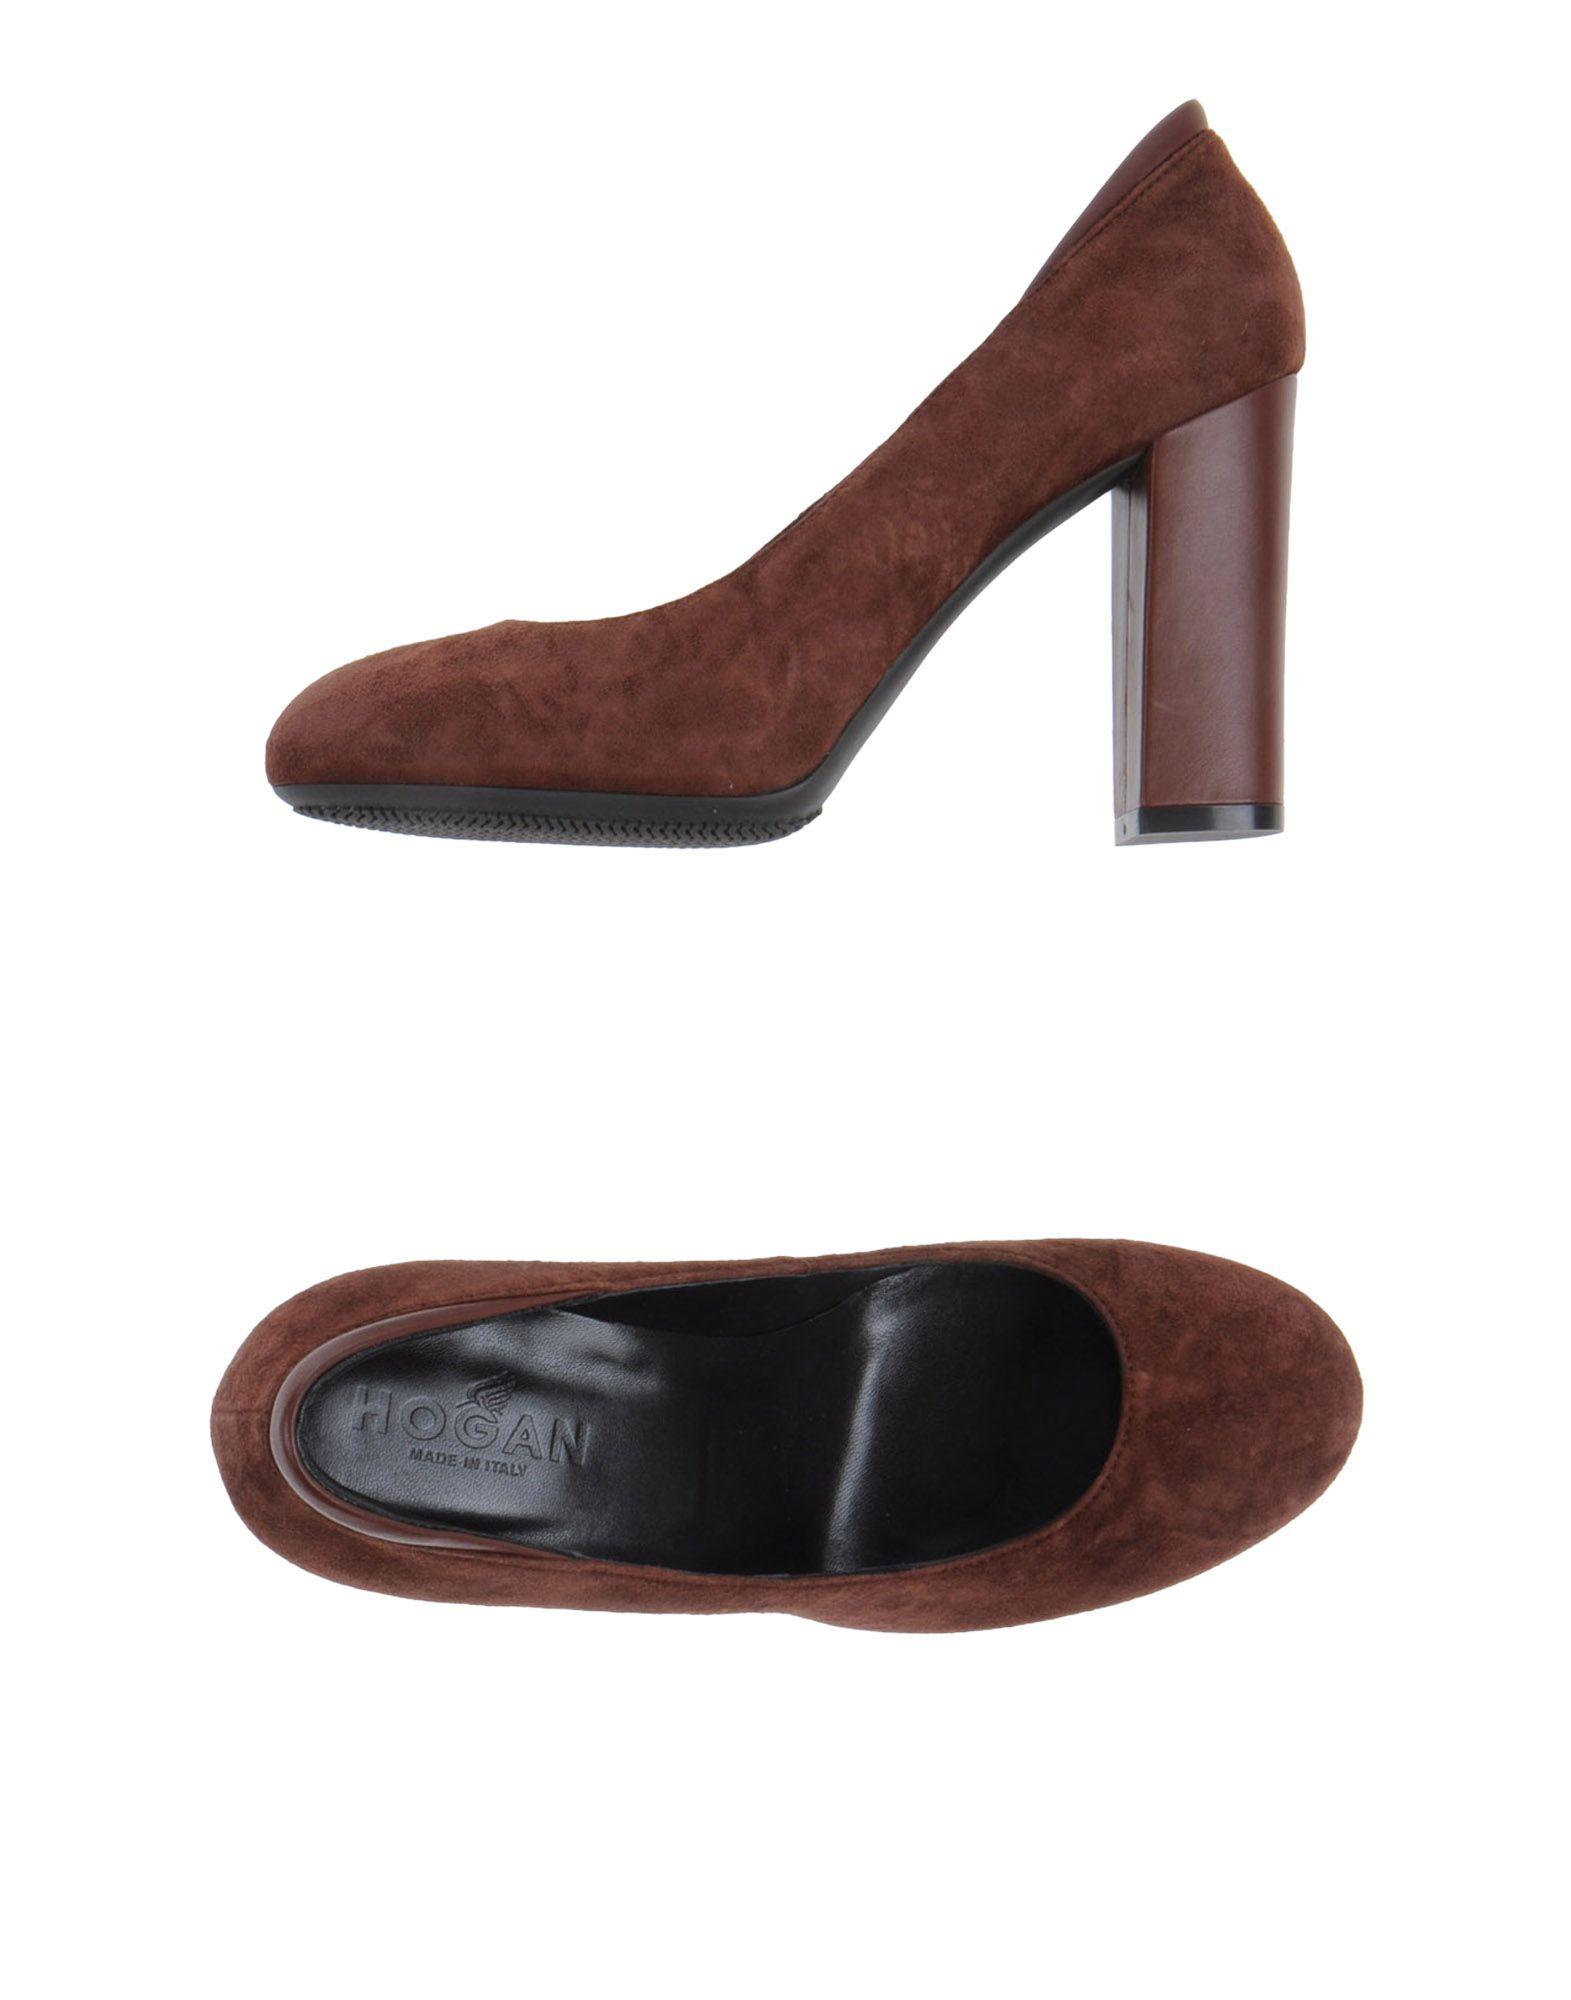 Haltbare  Mode billige Schuhe Hogan Pumps Damen  Haltbare 44528164WO Heiße Schuhe 36a25e